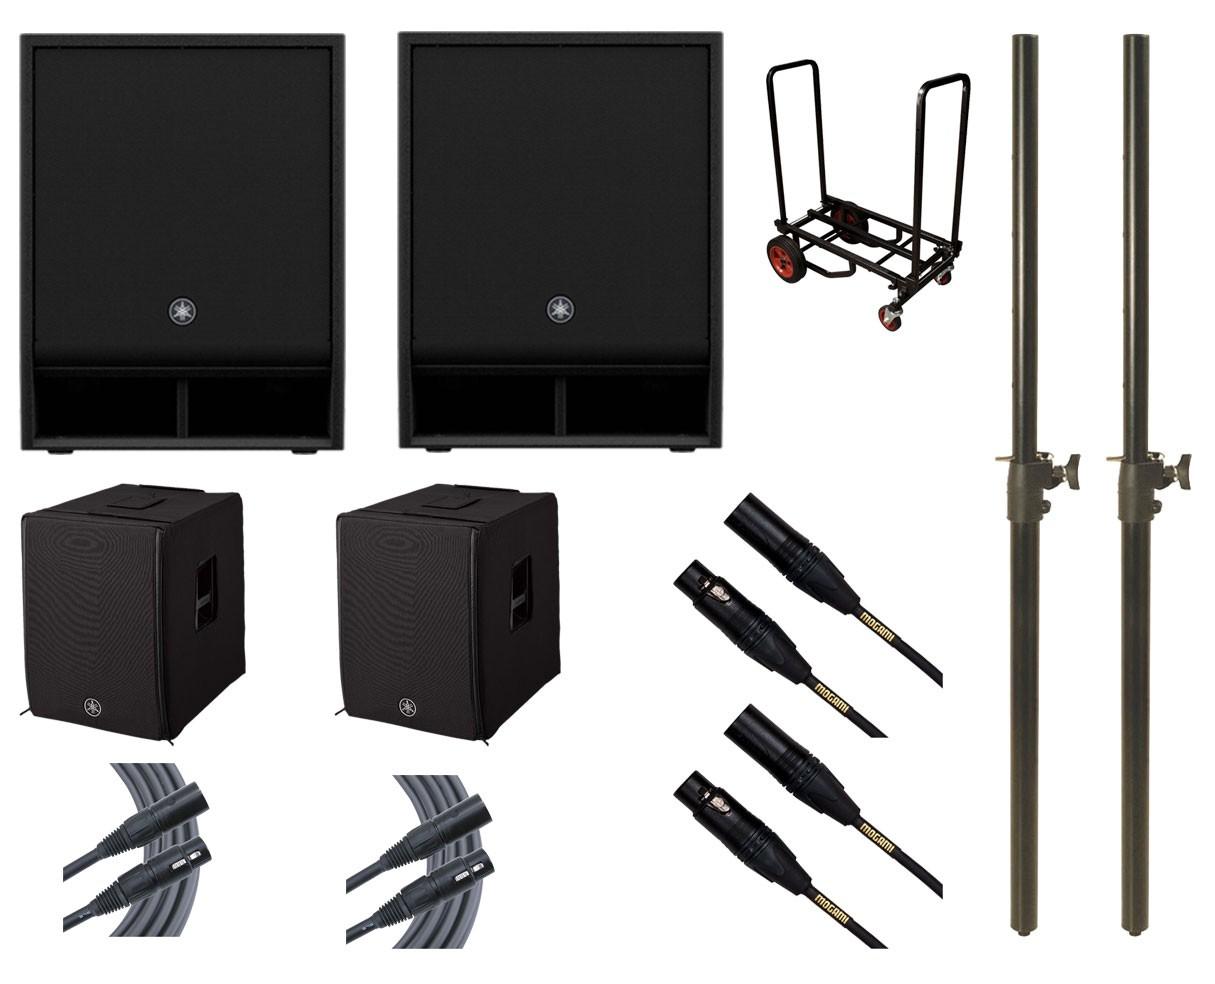 2x Yamaha DXS15XLF + Covers + Mogami Cables + Cart + M20 Speaker Poles